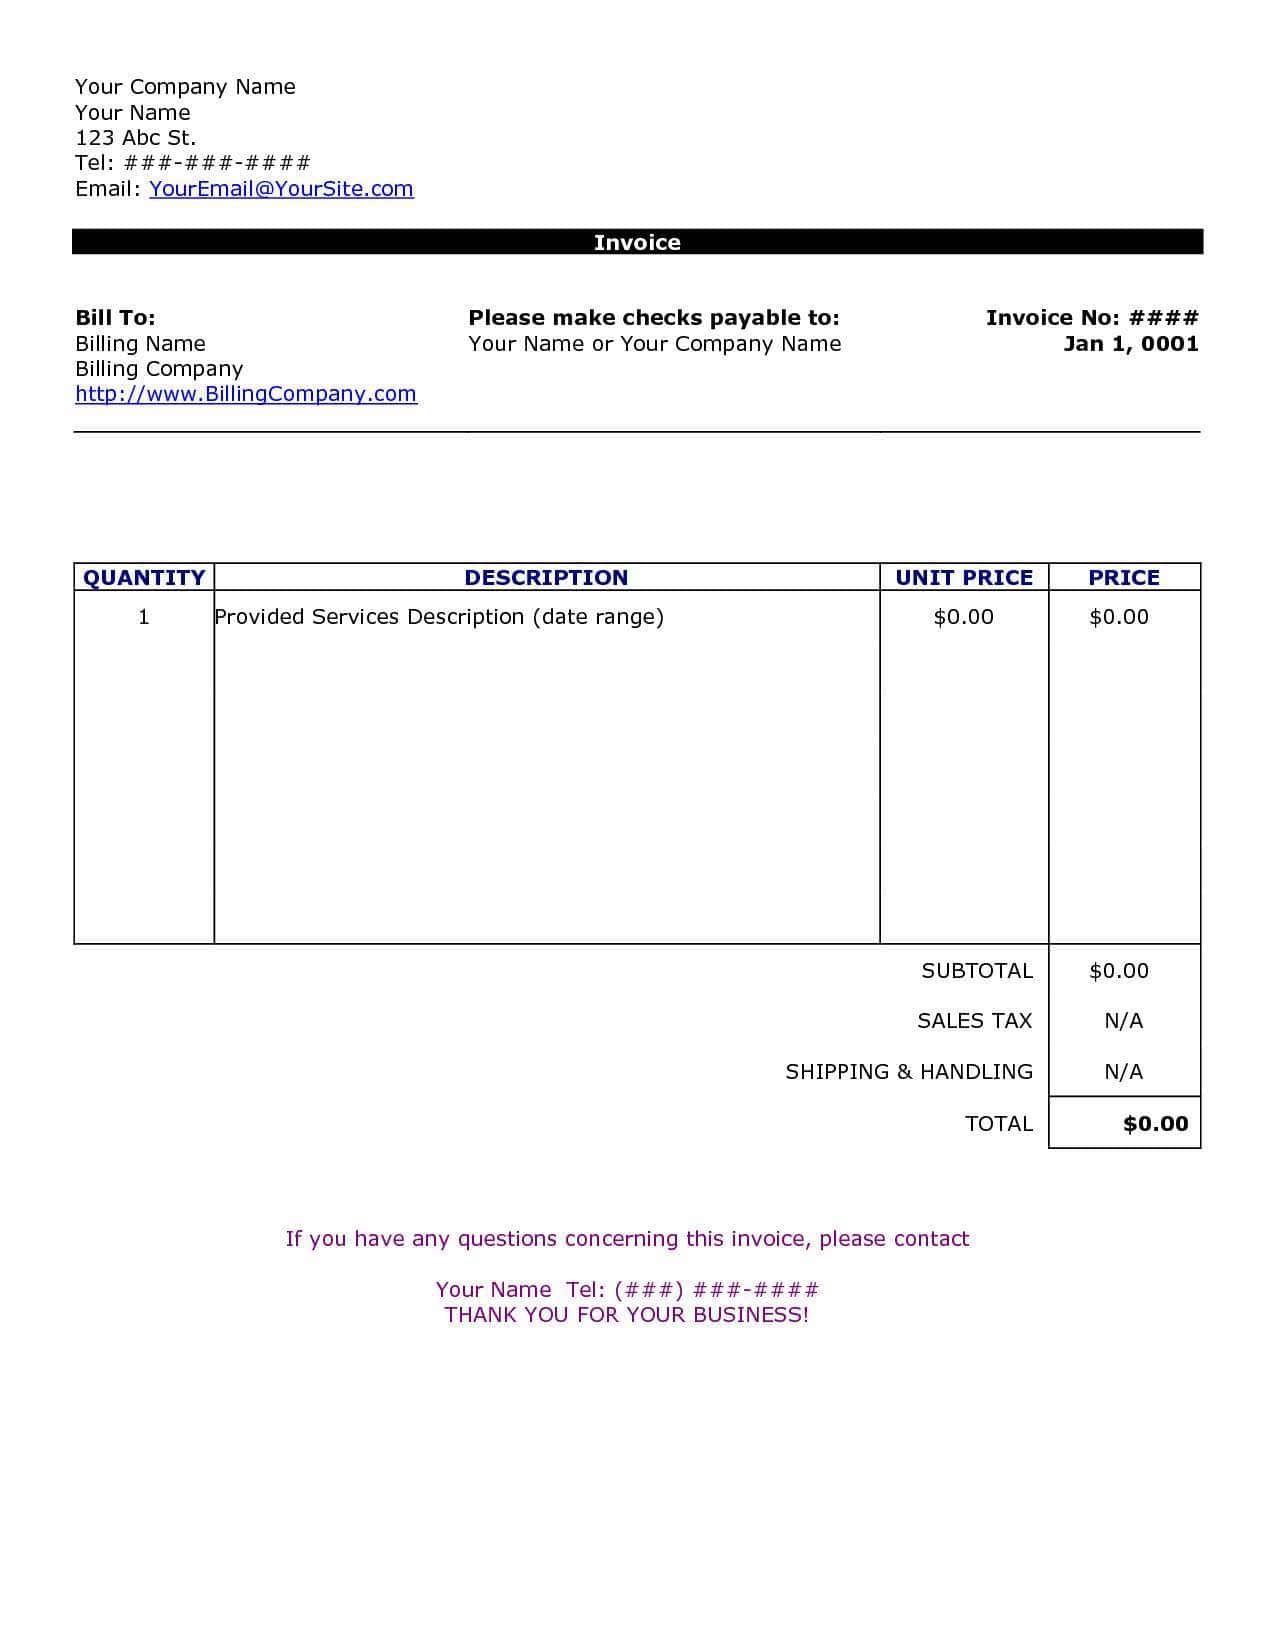 Sample Of Billing Invoice Invoice Template Word Invoice Template Bill Template